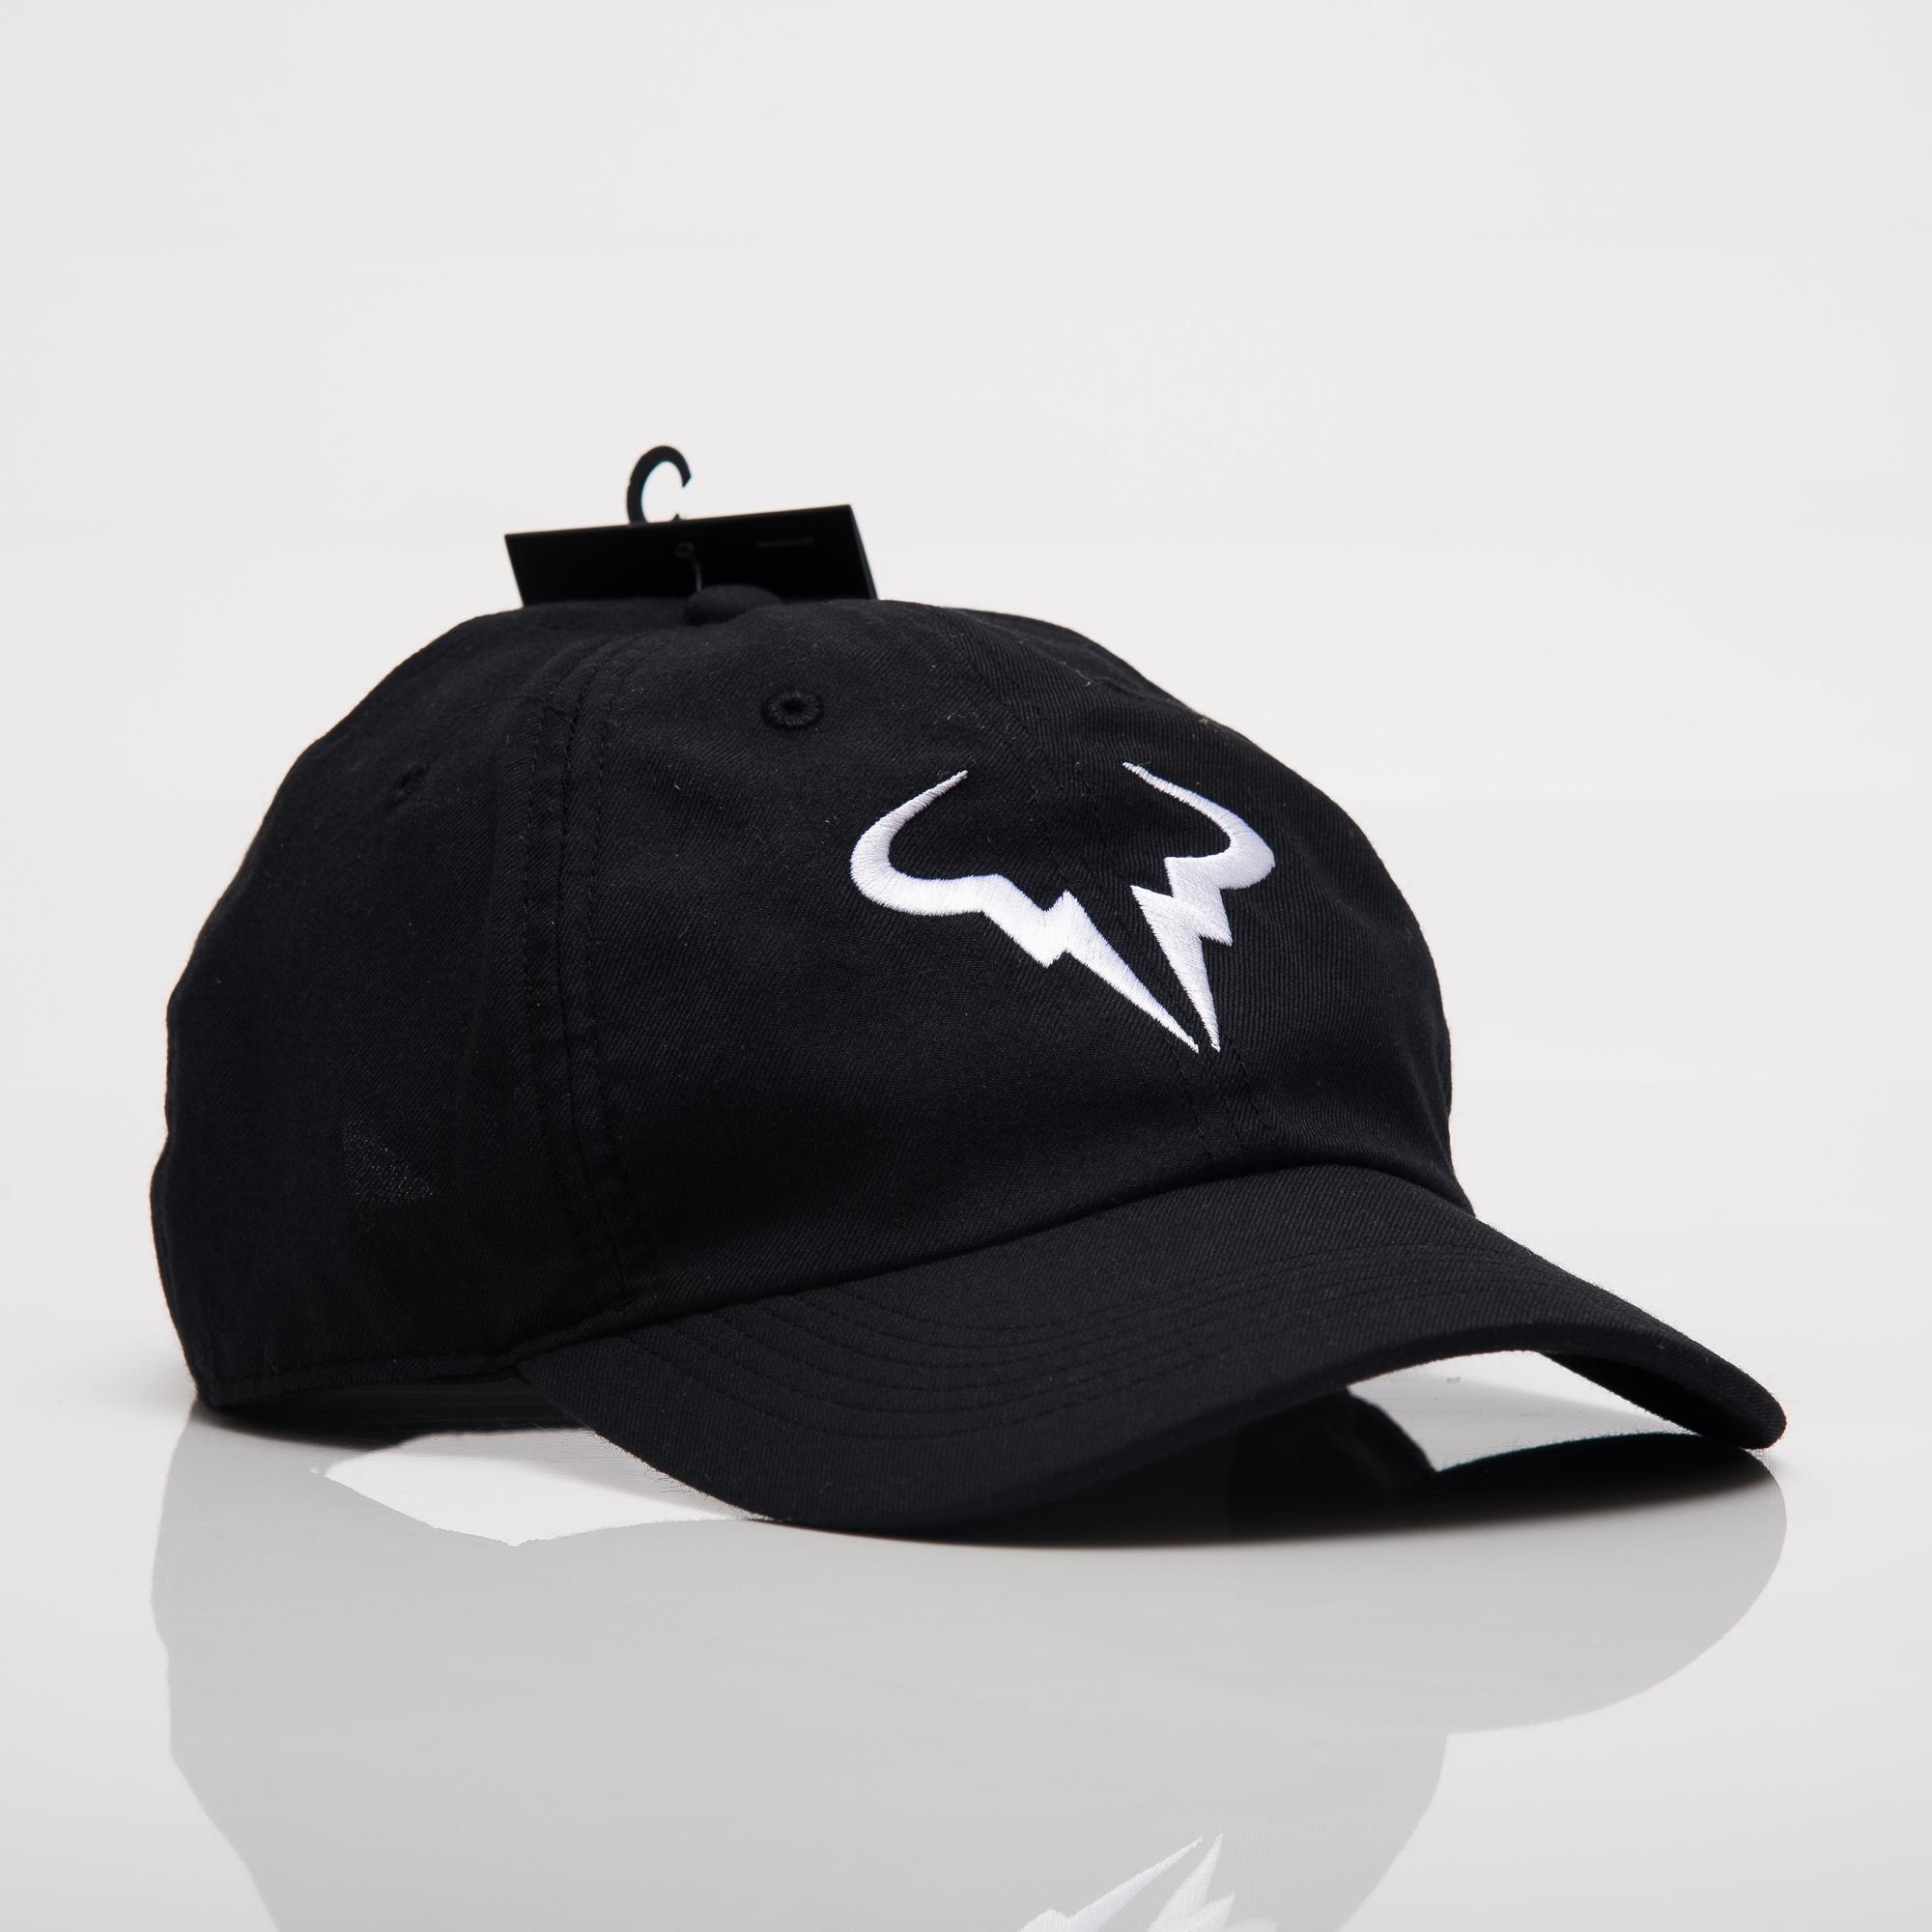 de7b9f012fe69 Nike Rafael Nadal Aerobill H86 Cap - SPORTING GOODS Caps